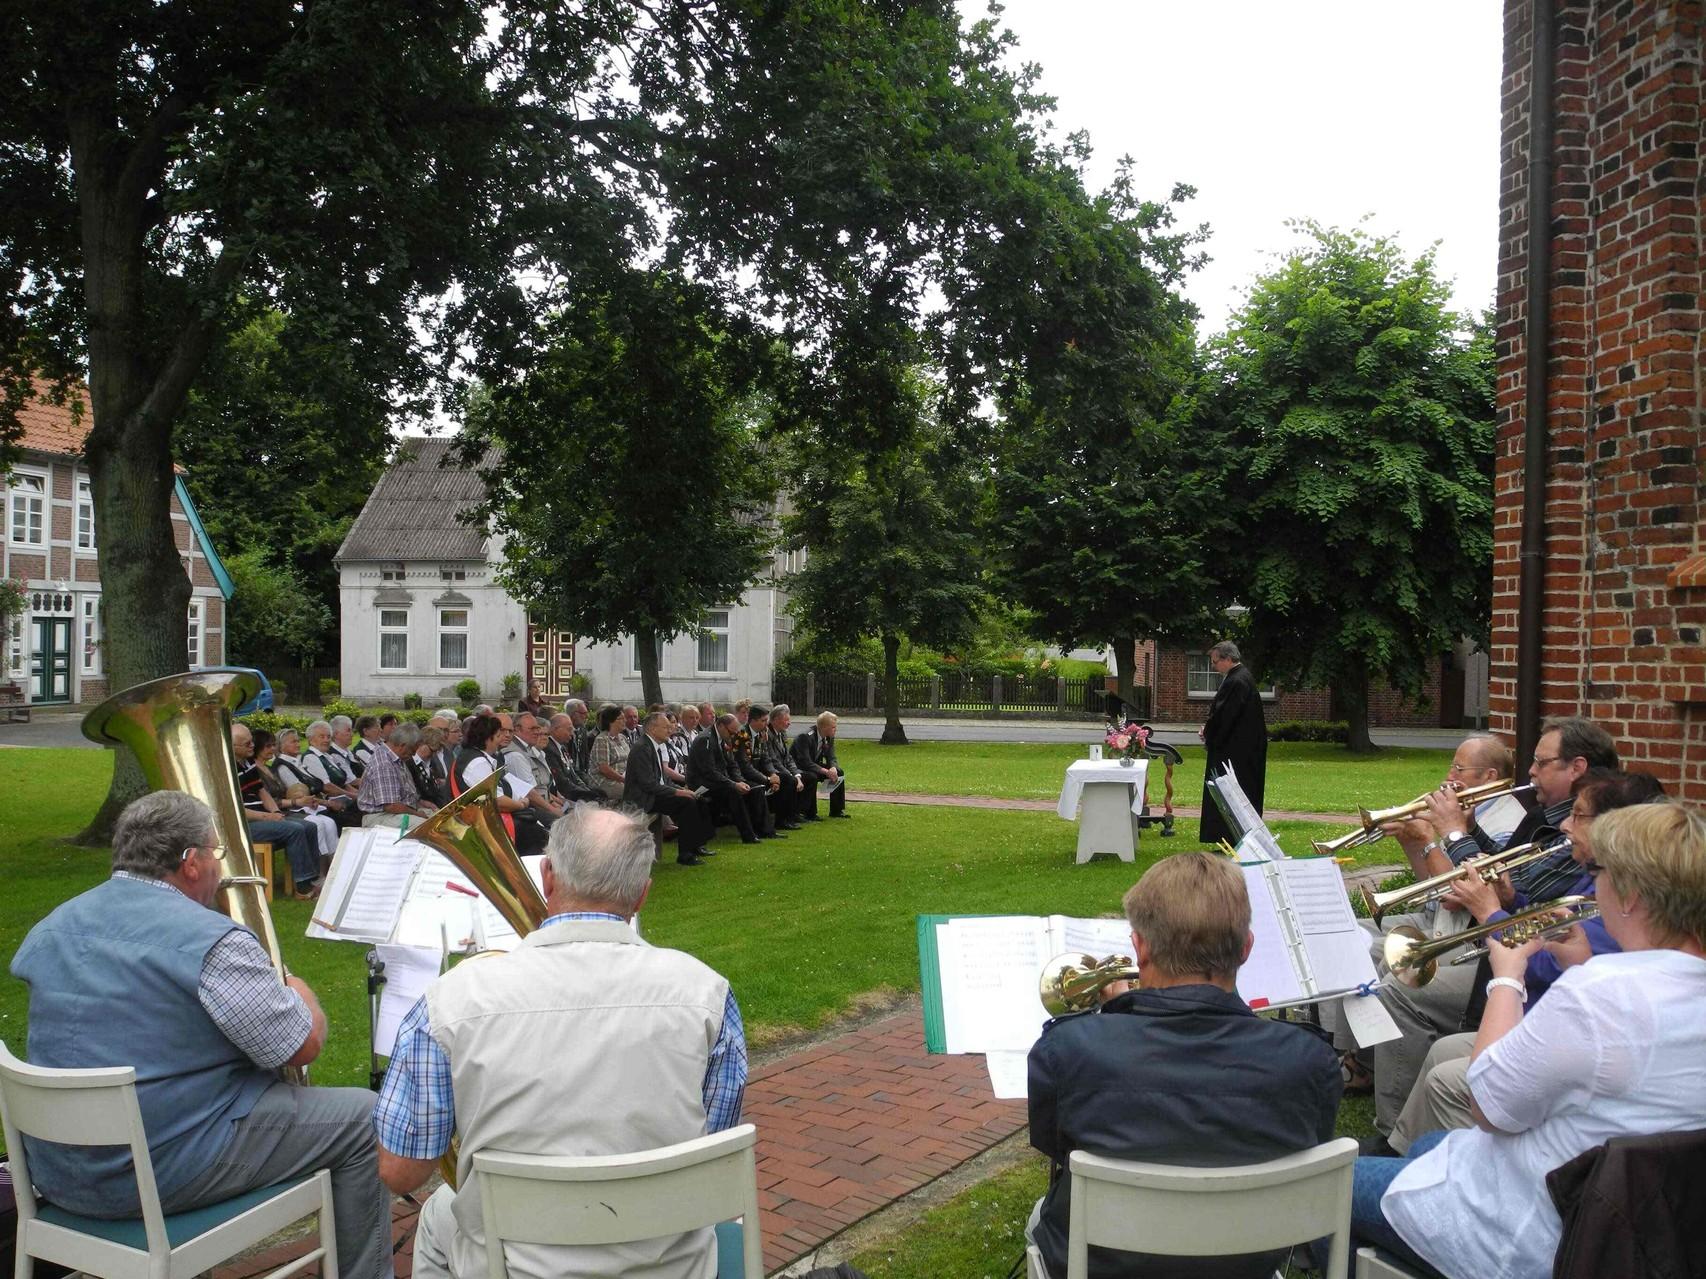 Am Sonntagmorgen findet traditionell der Feldgottesdienst statt